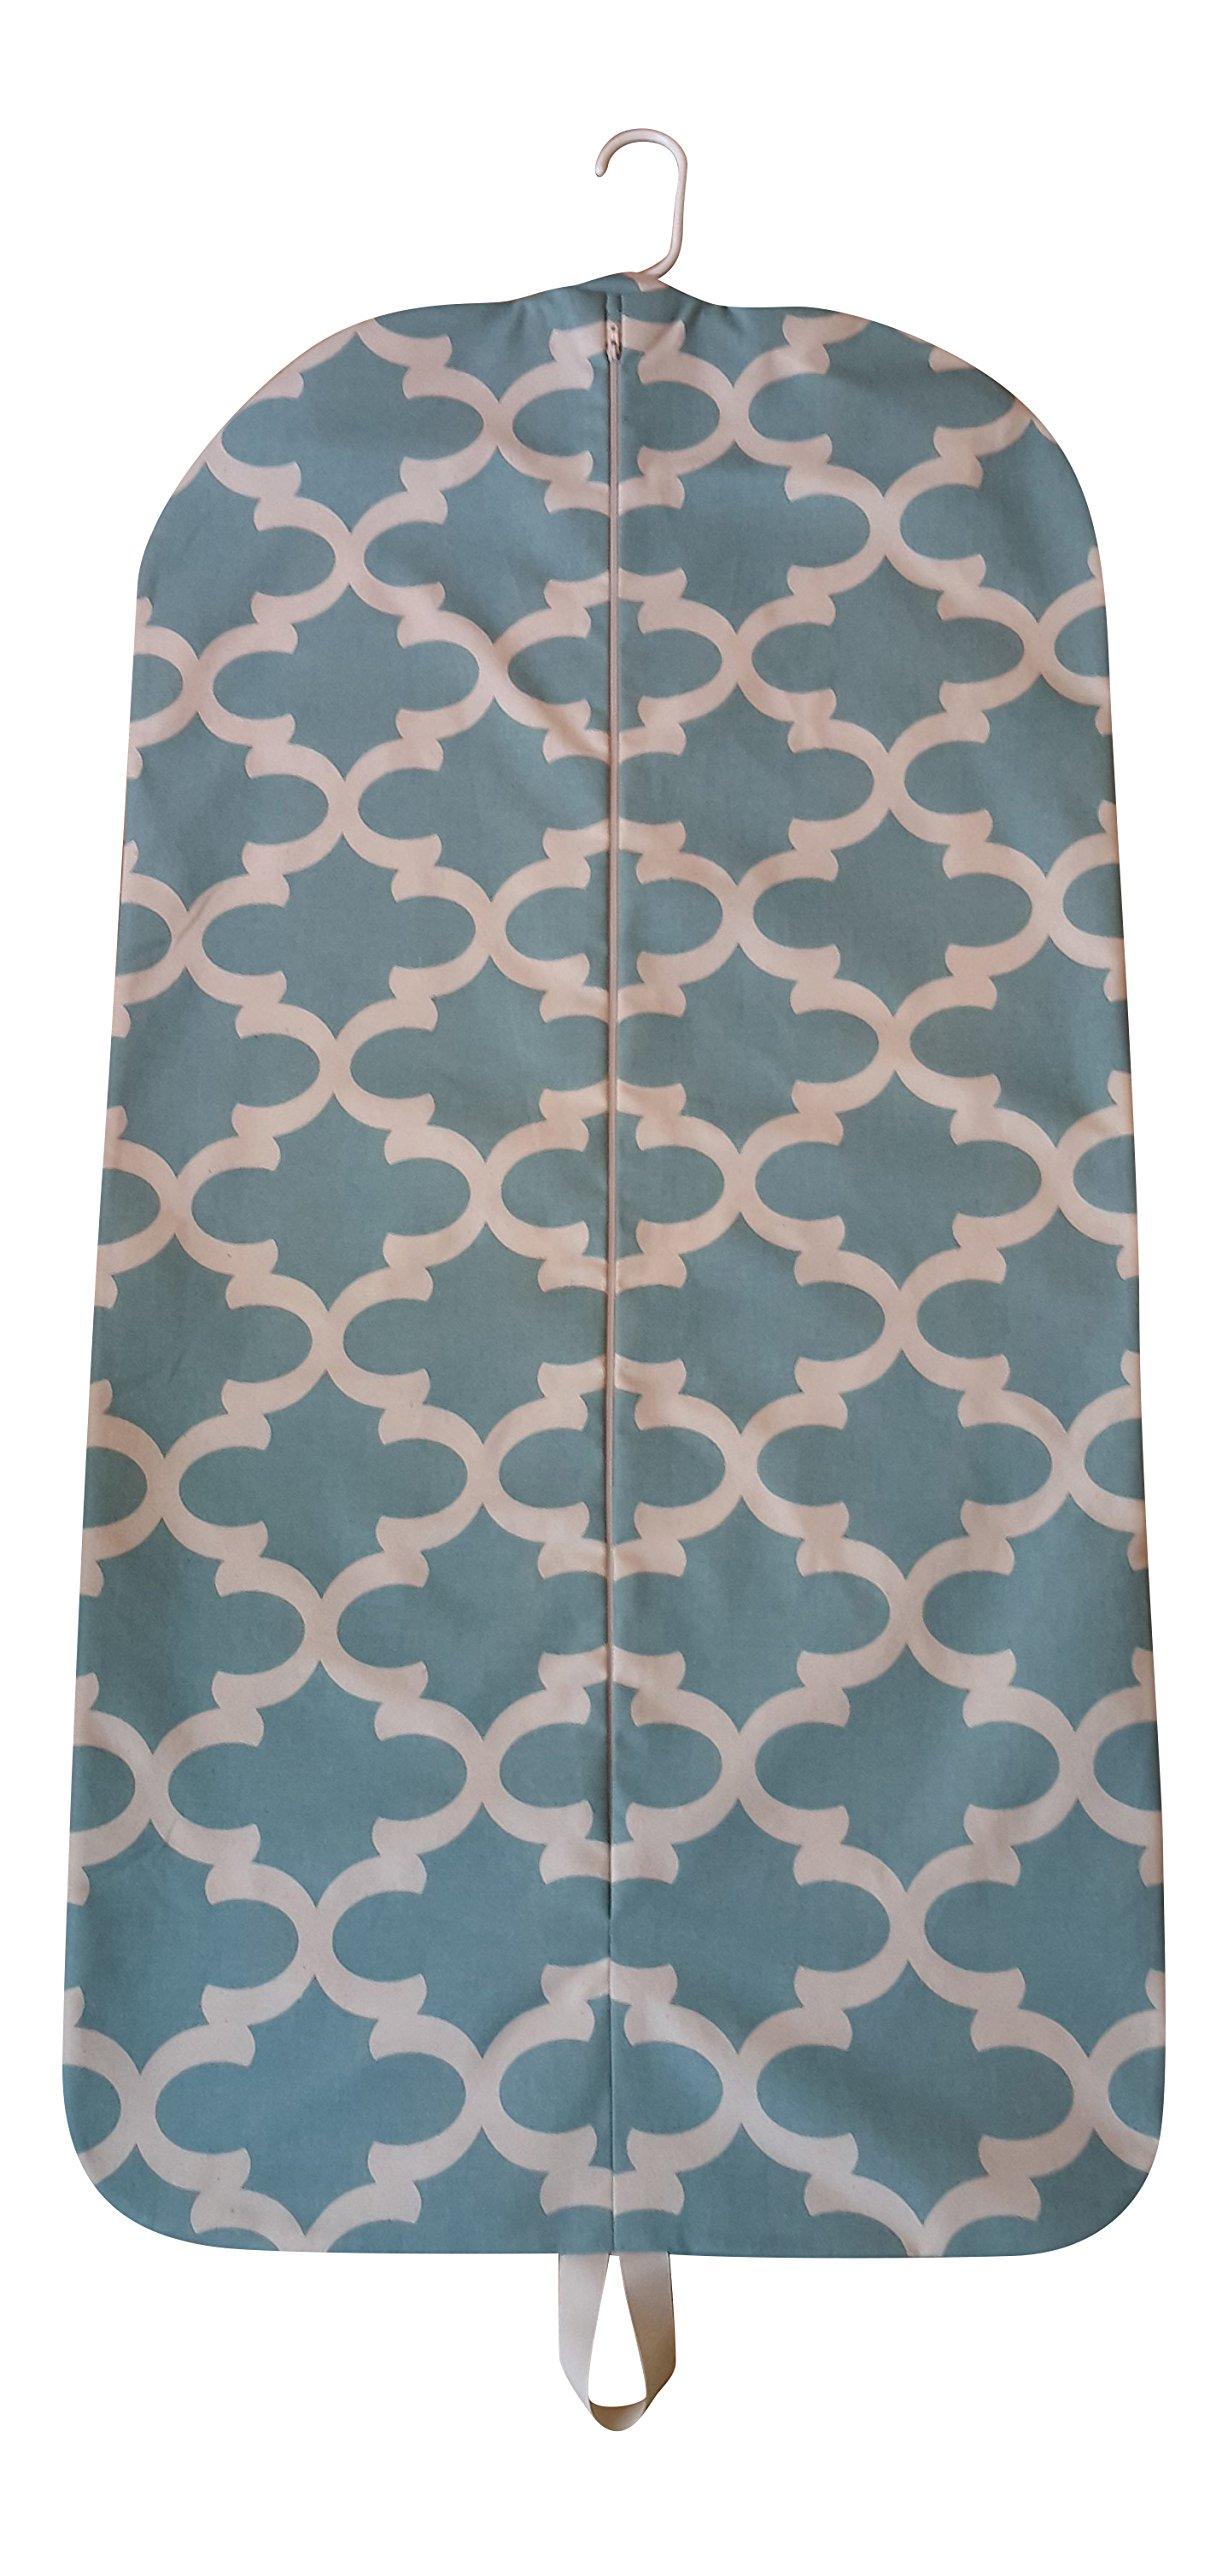 Carry It Well Women's Hanging Garment Bag Light Aqua and Cream Moroccan Gate